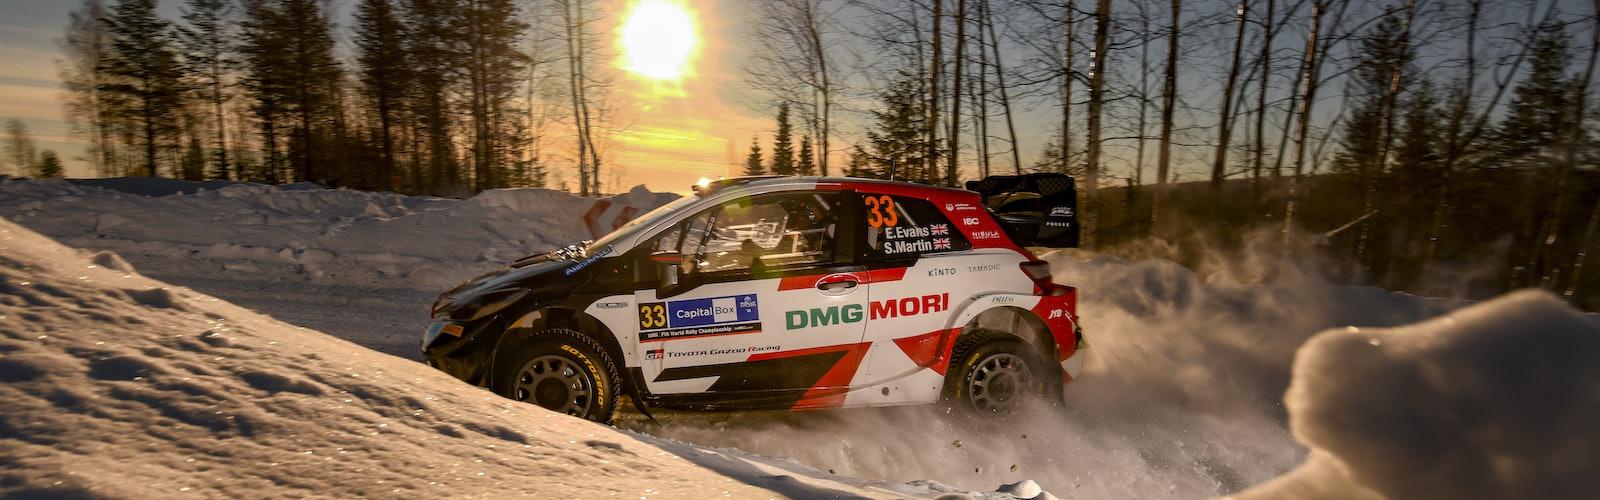 WRC_2021_Rd2._201